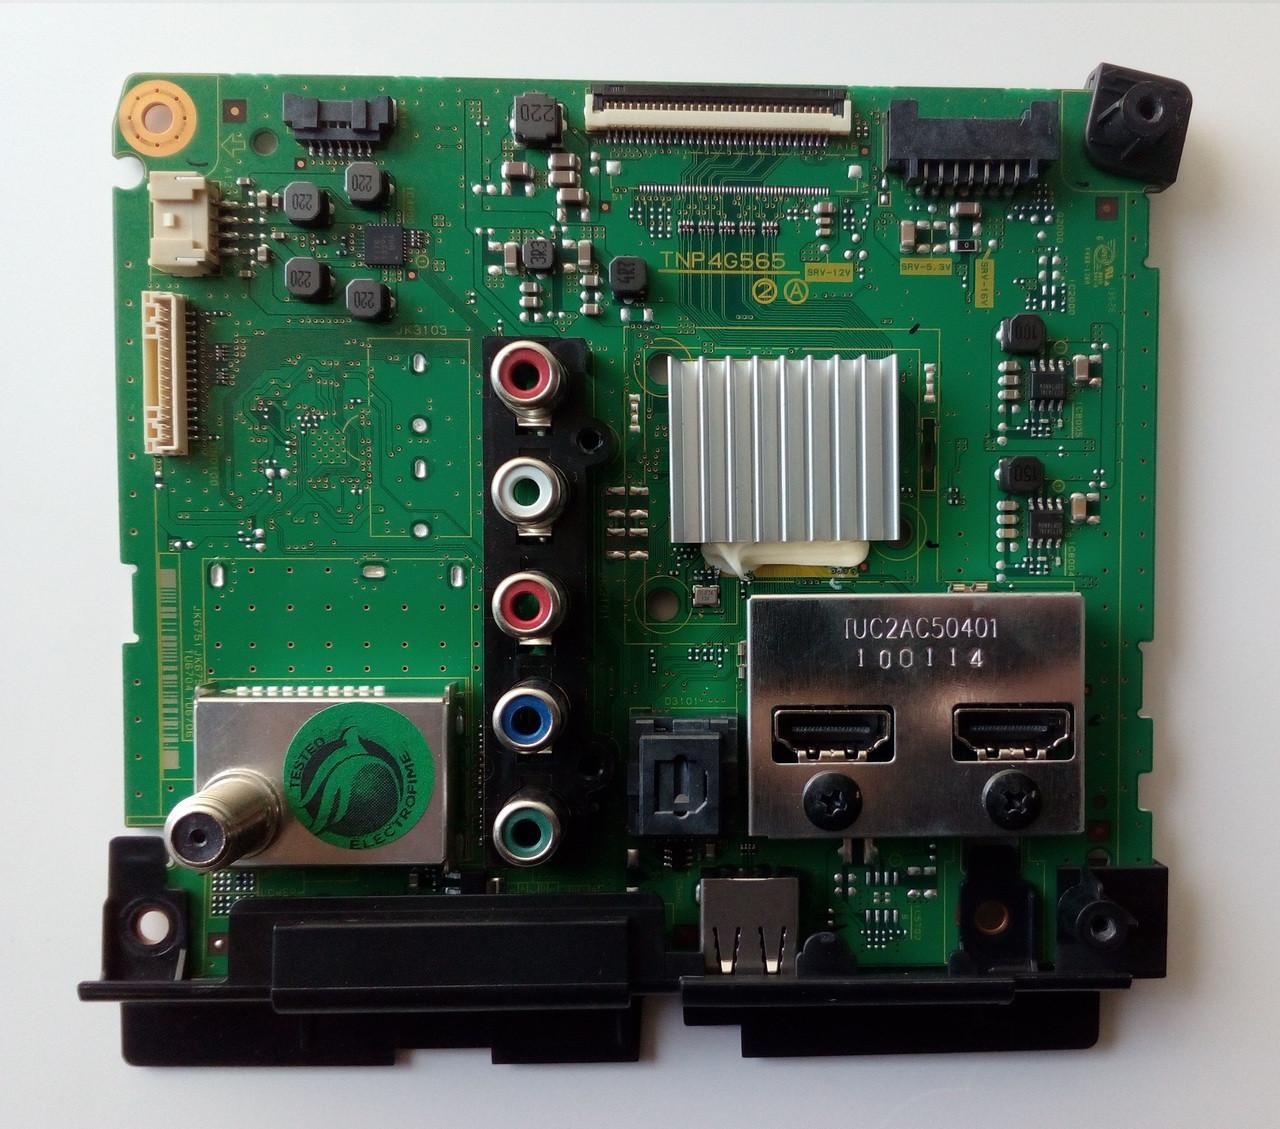 Panasonic Tc  Tnp4g565